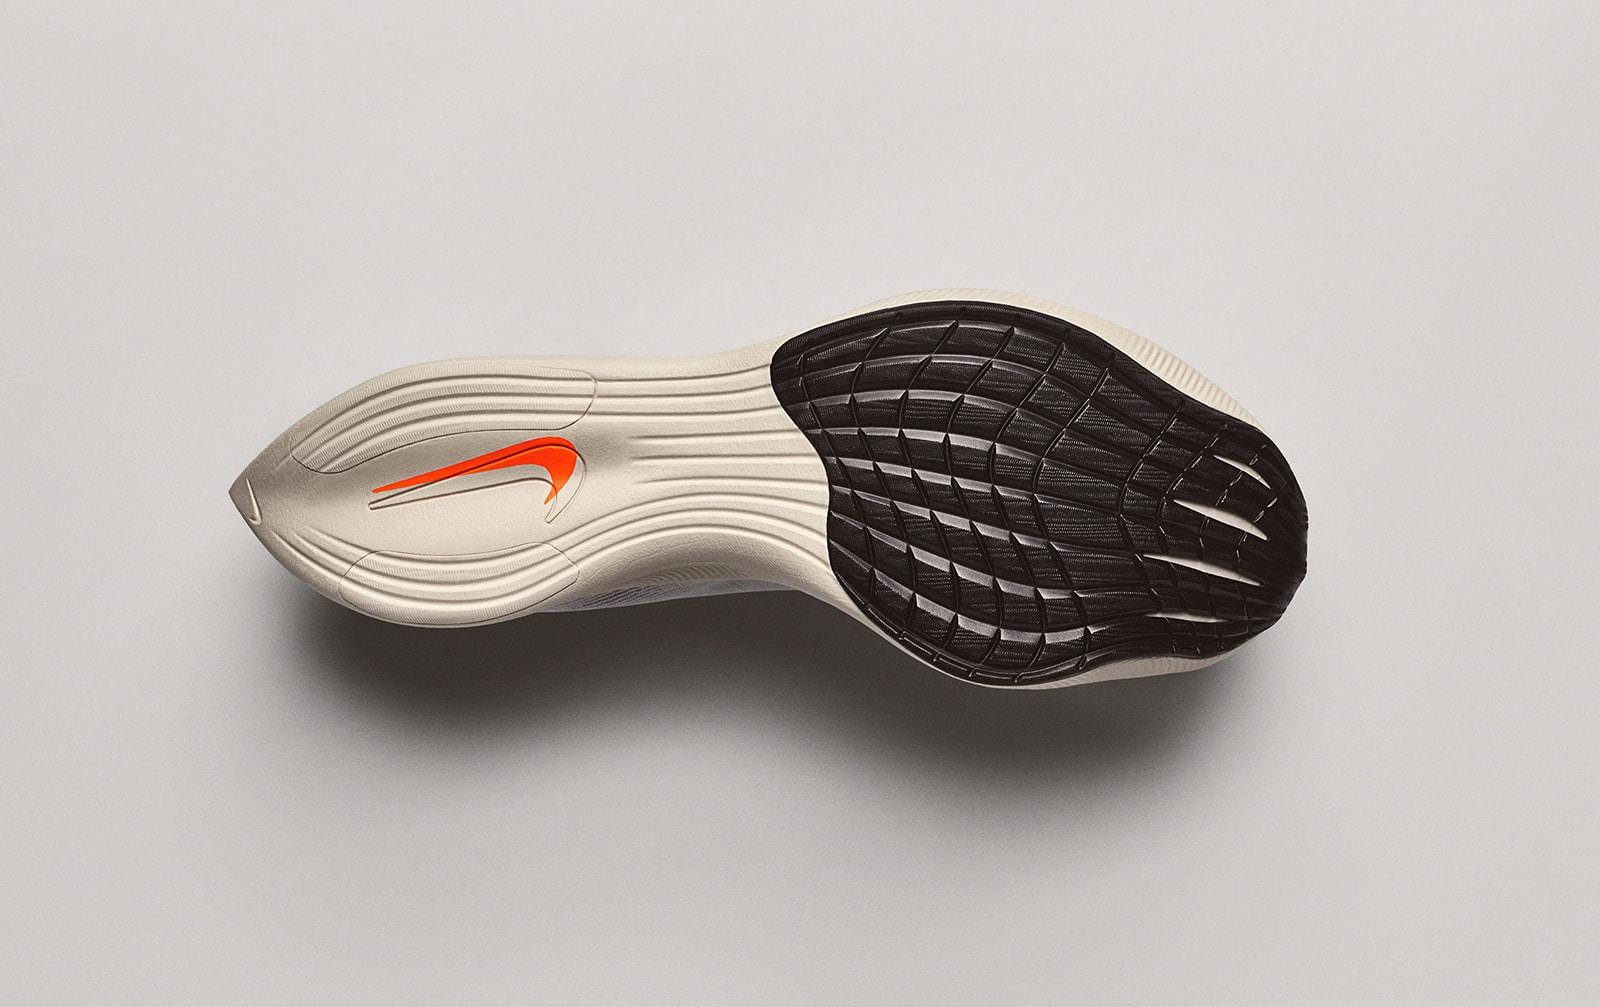 Подошва кроссовок